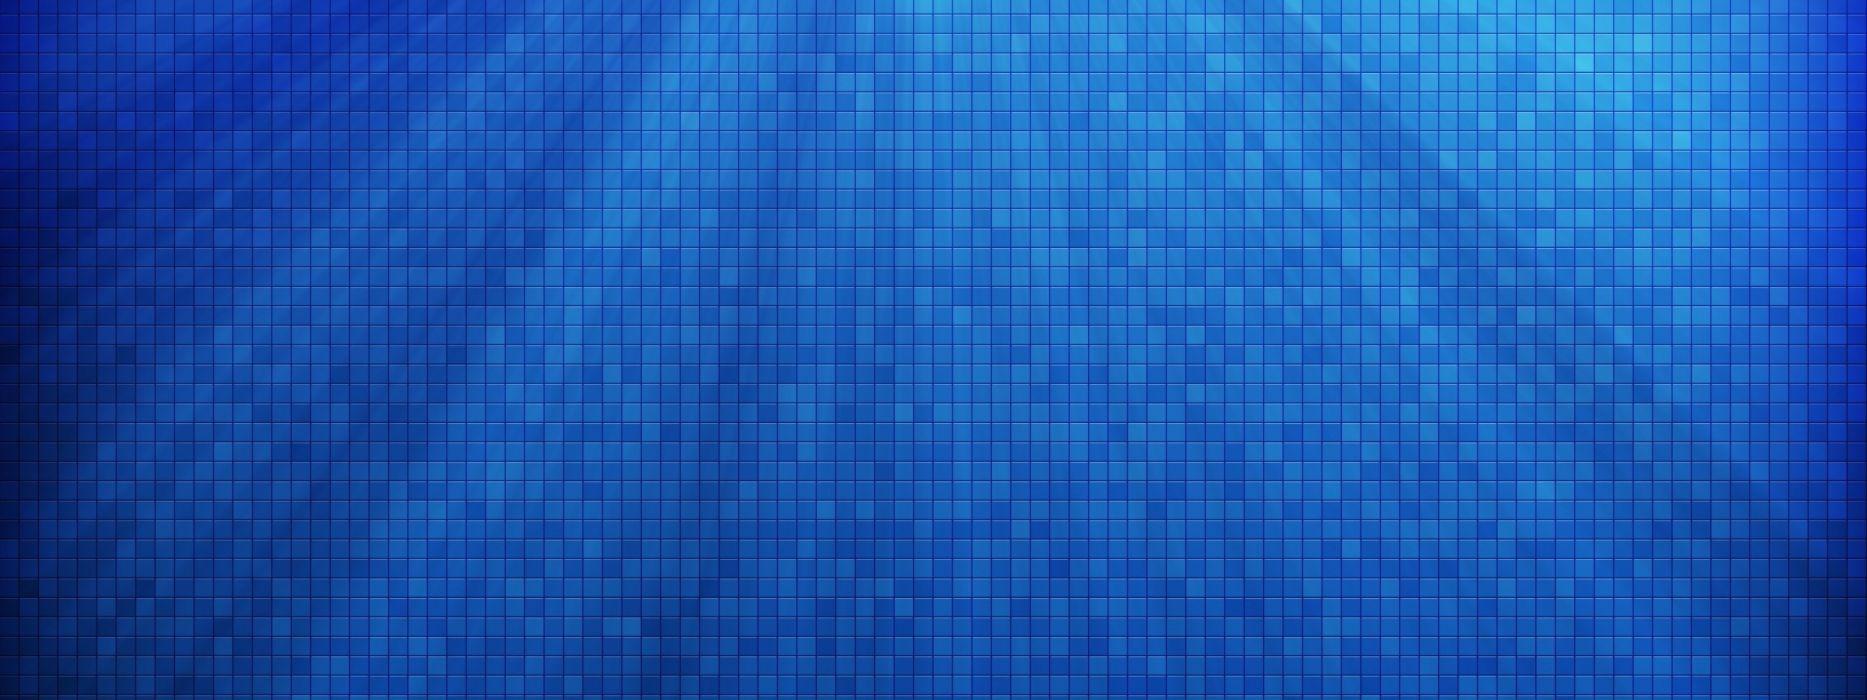 multi monitor dual screen widescreen wallpaper